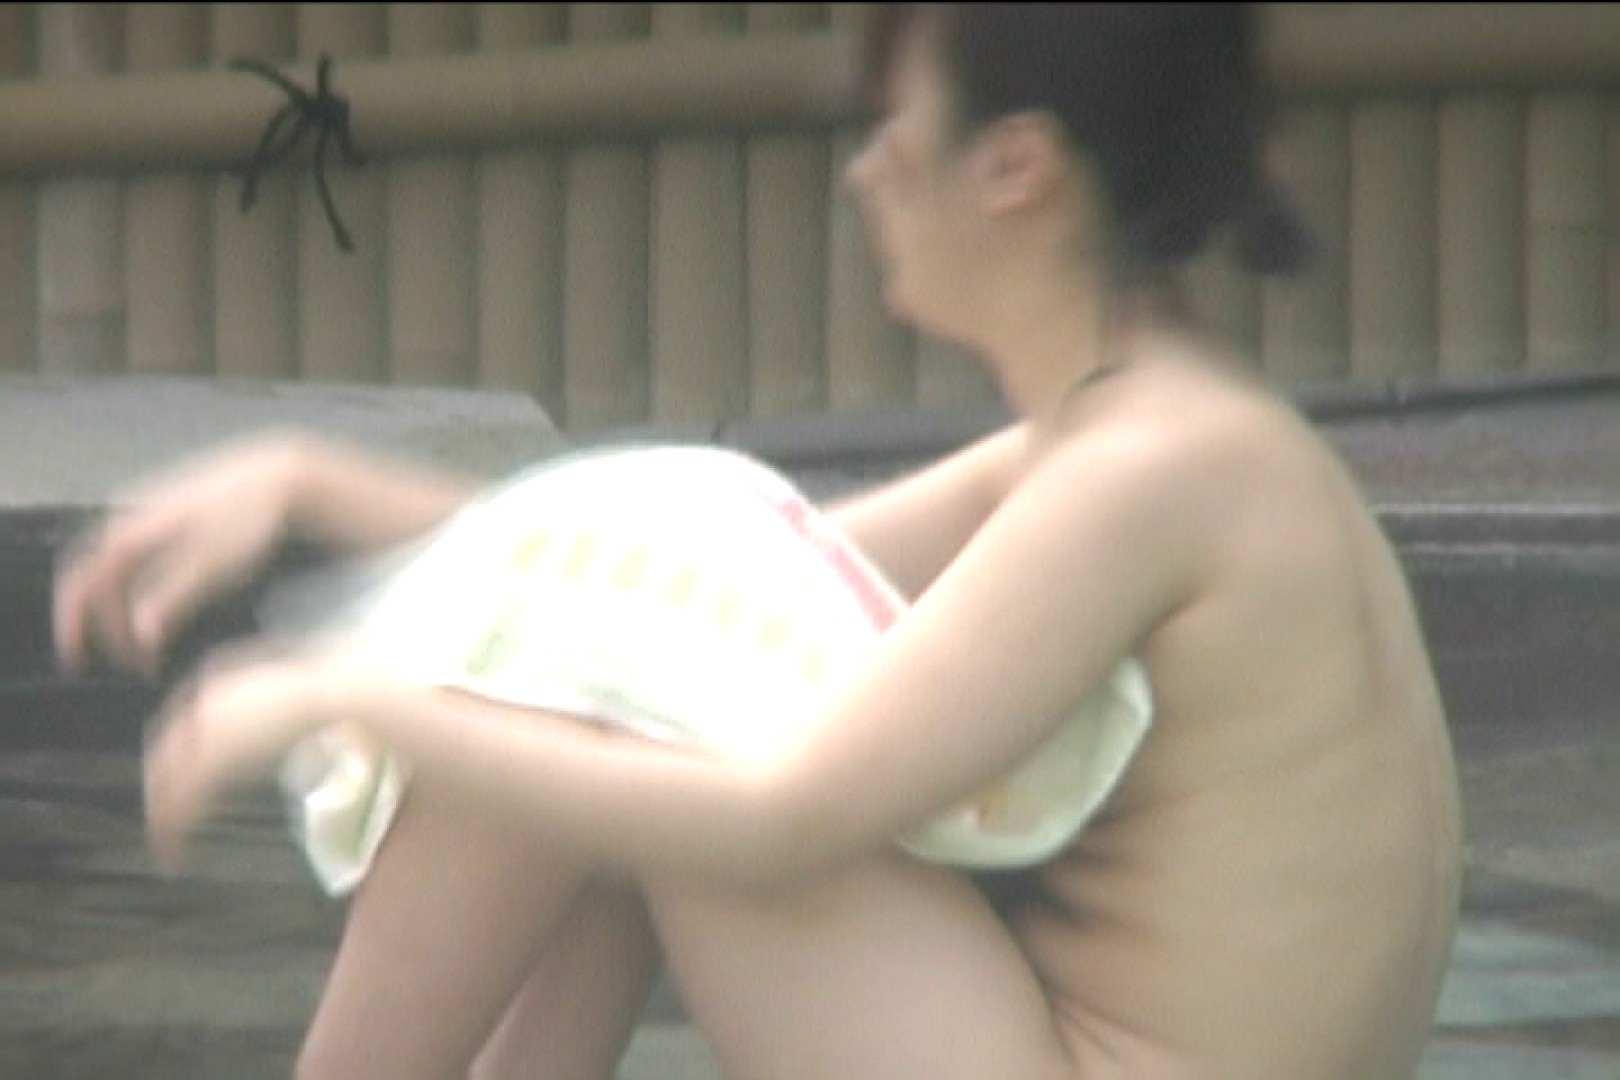 Aquaな露天風呂Vol.140 0  55連発 30